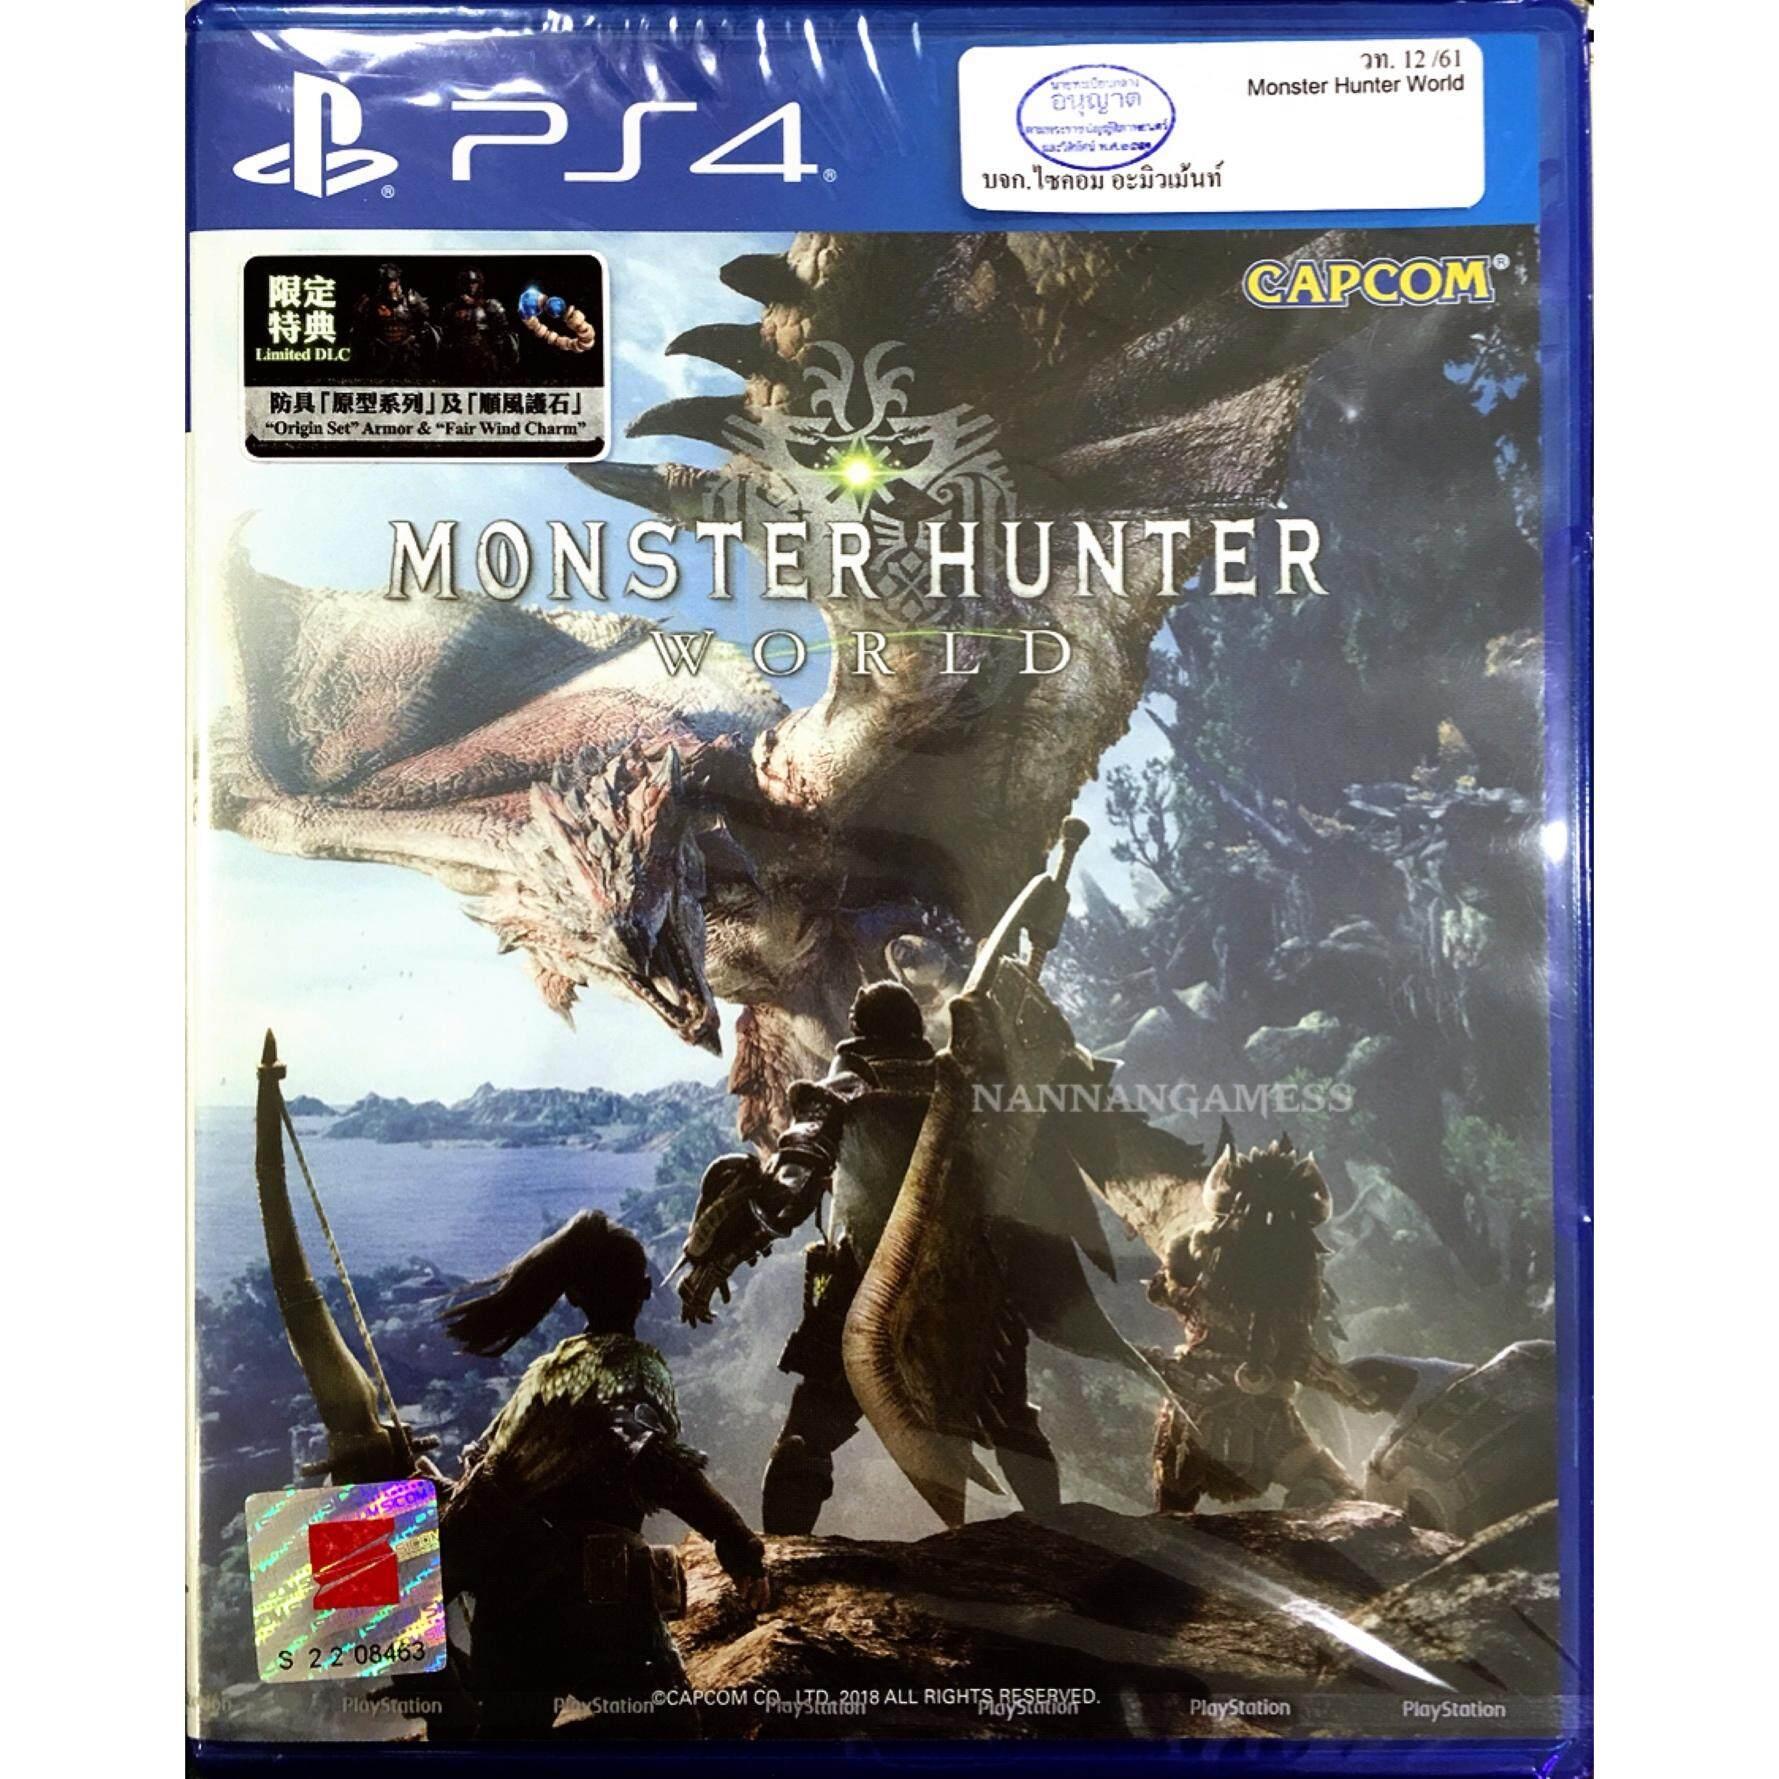 PS4 Monster Hunter World (Z3) (English)